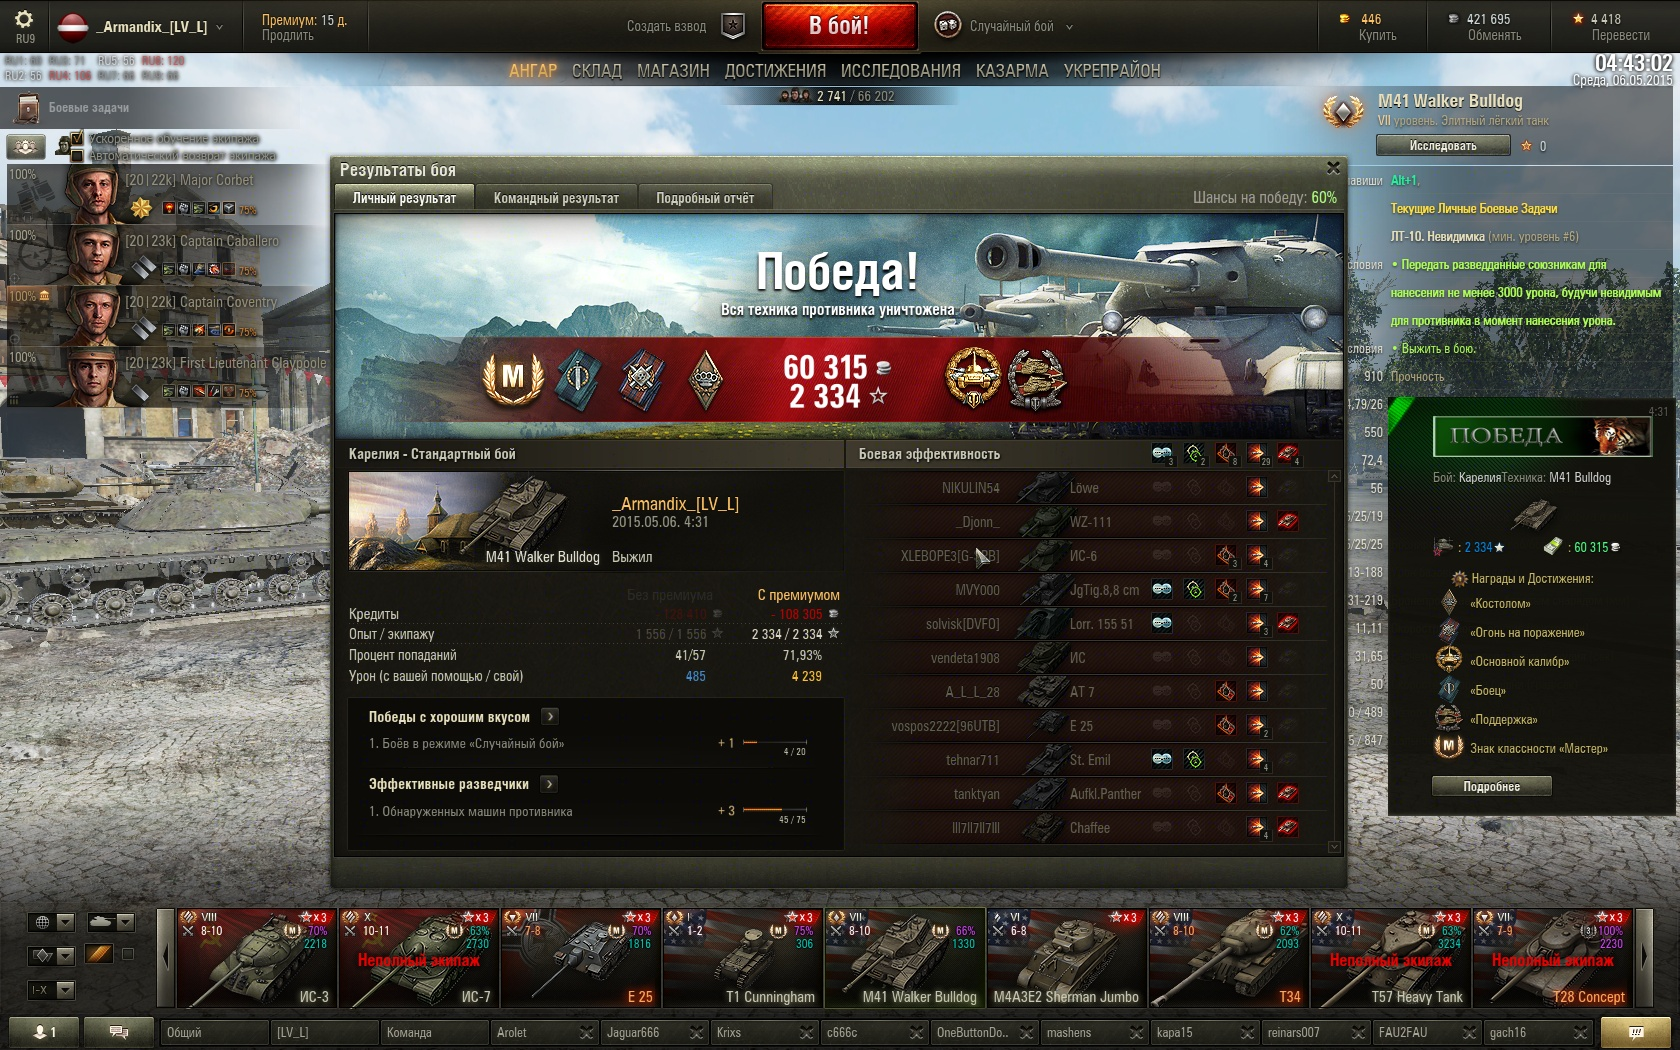 (Master) M41 Walker Bulldog 8tfby20vgk41oy8cjqho